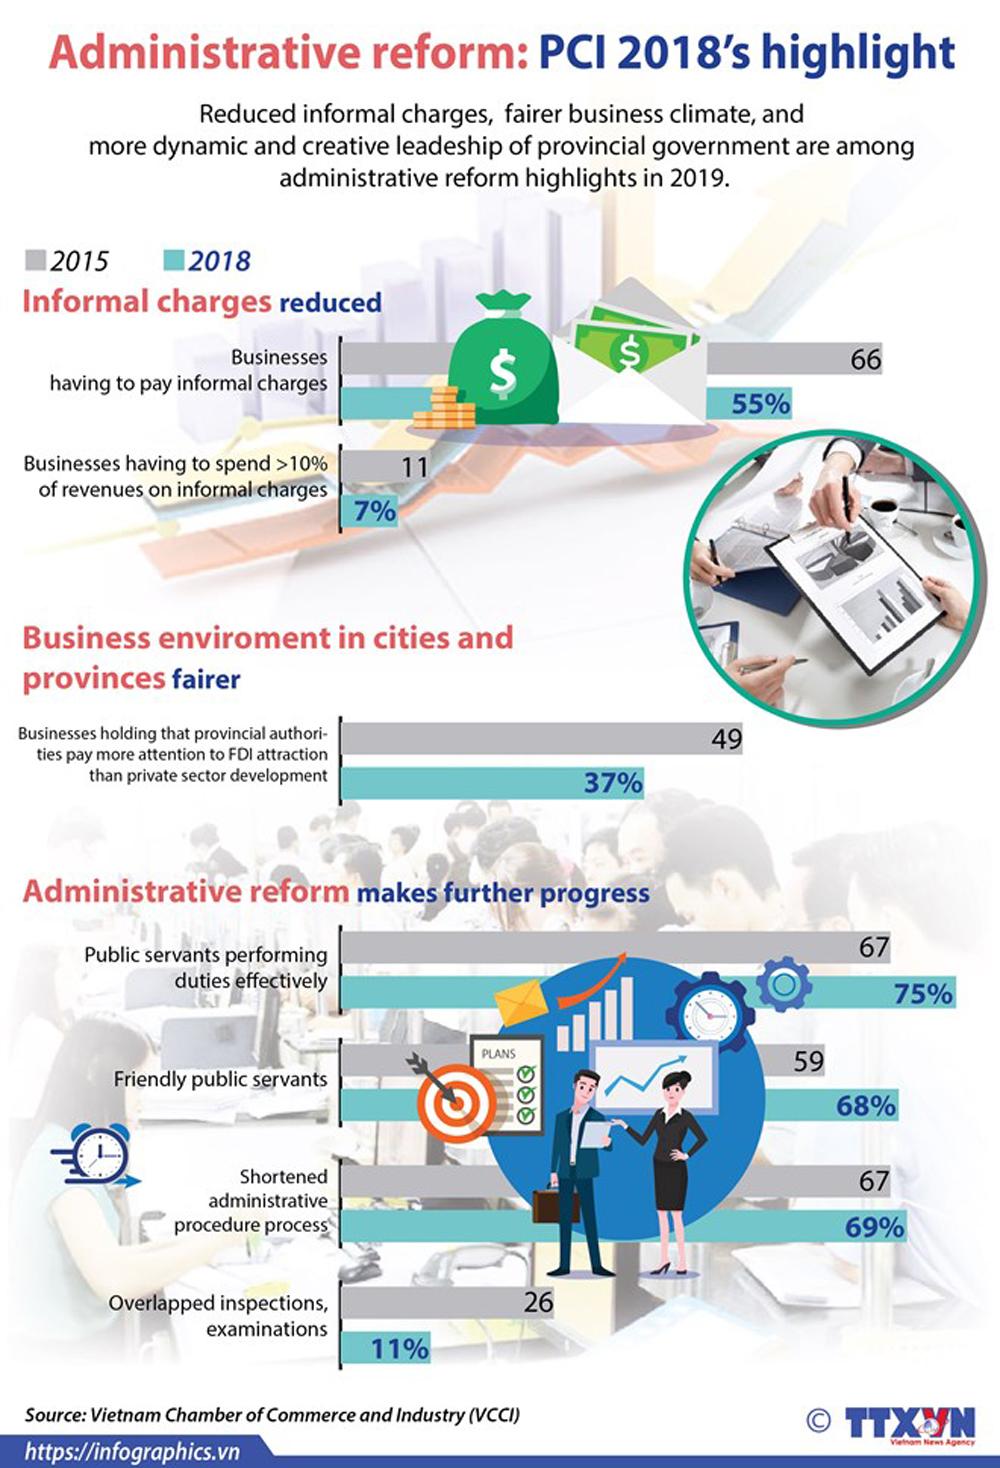 Administrative reform, PCI 2018, highlight, Quang Ninh, Da Nang, administrative procedure